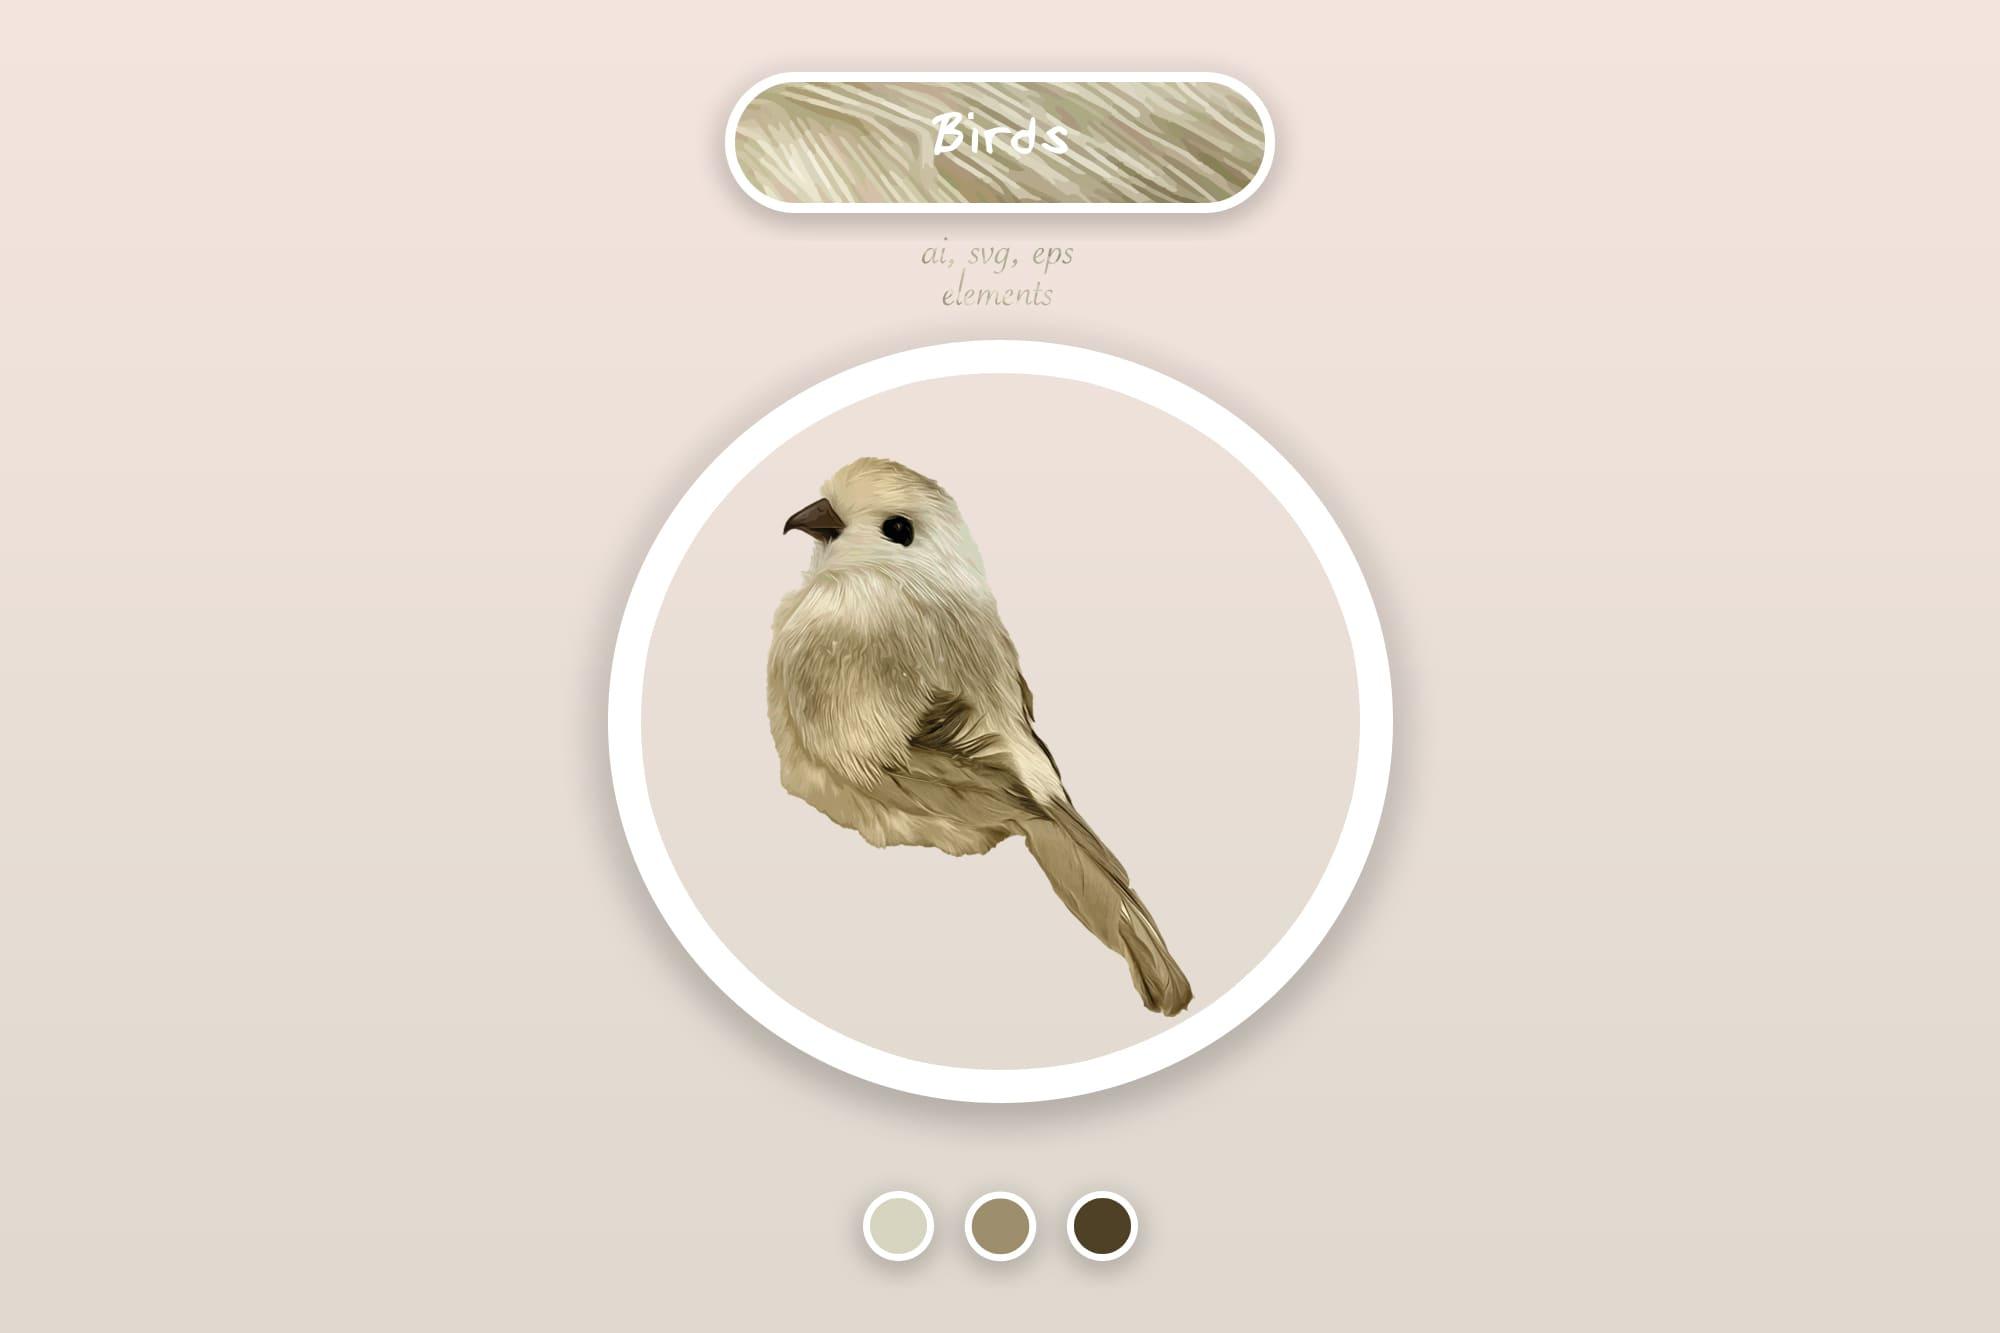 496 Christmas Illustrations: Christmas Vectors Bundle SVG, EPS, AI - Birds 3a